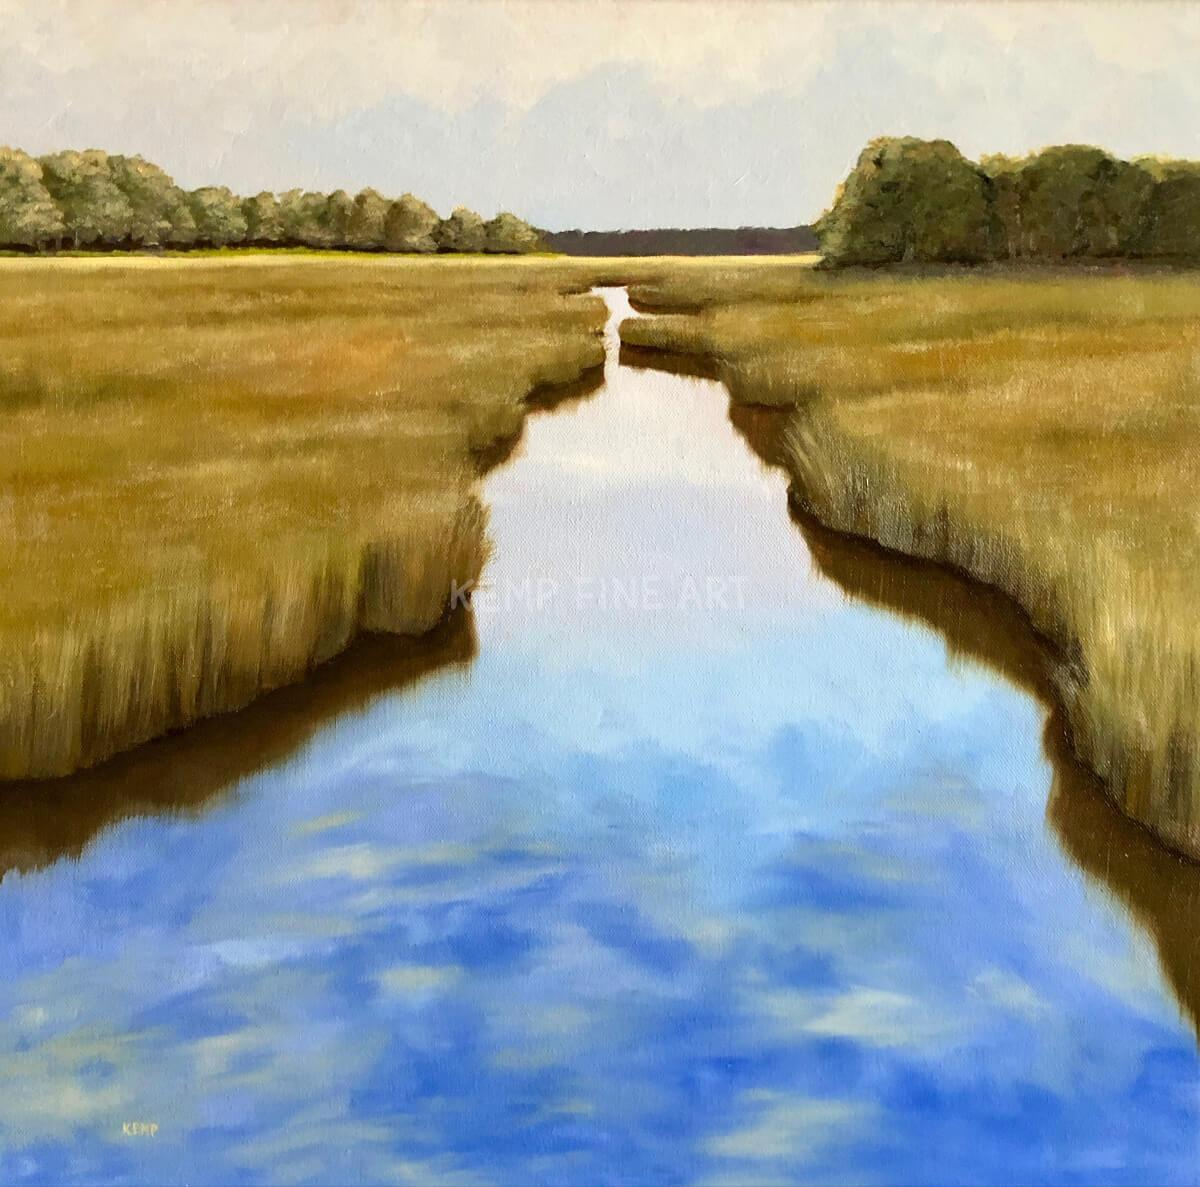 Morning Marsh Light | Oil on Canvas - by Jim Kemp